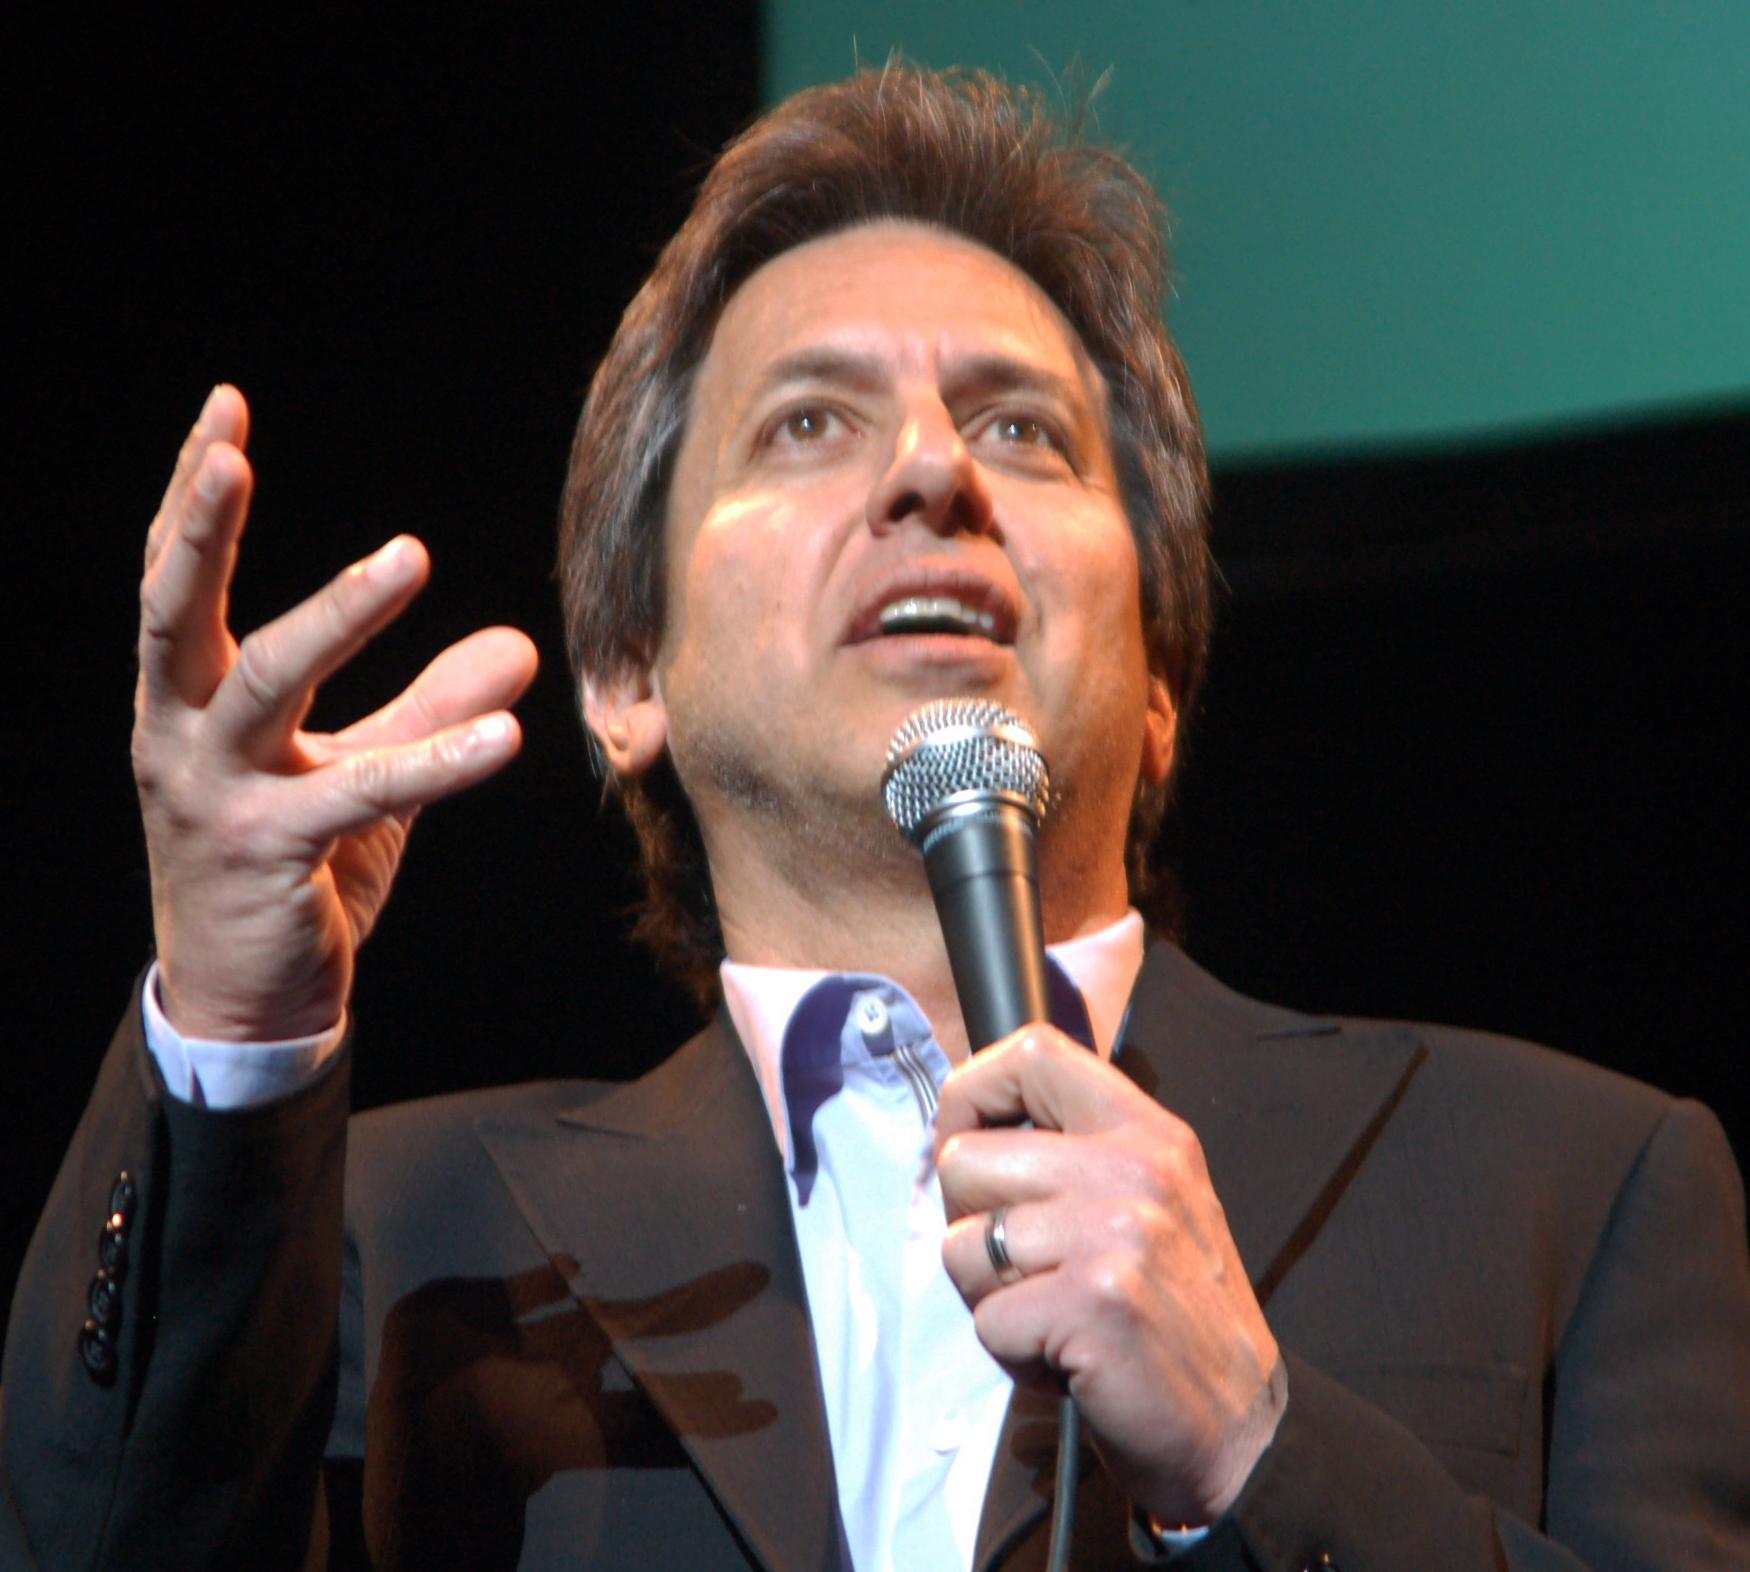 English: Ray Romano at the Night of Comedy 9 b...